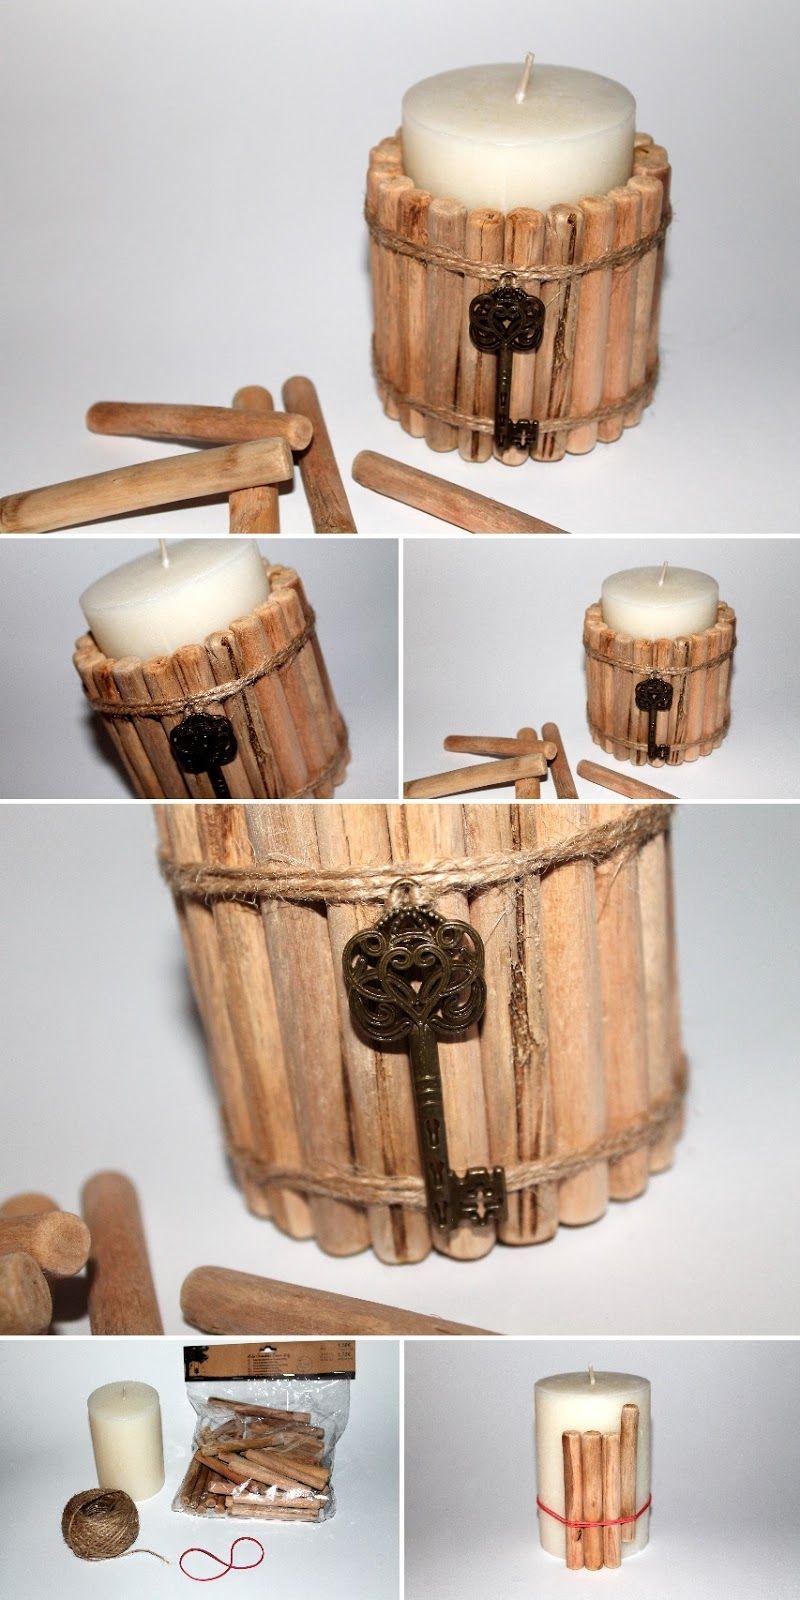 DIY Treibholzkerze | Einfache diy, Treibholz und Naturmaterialien